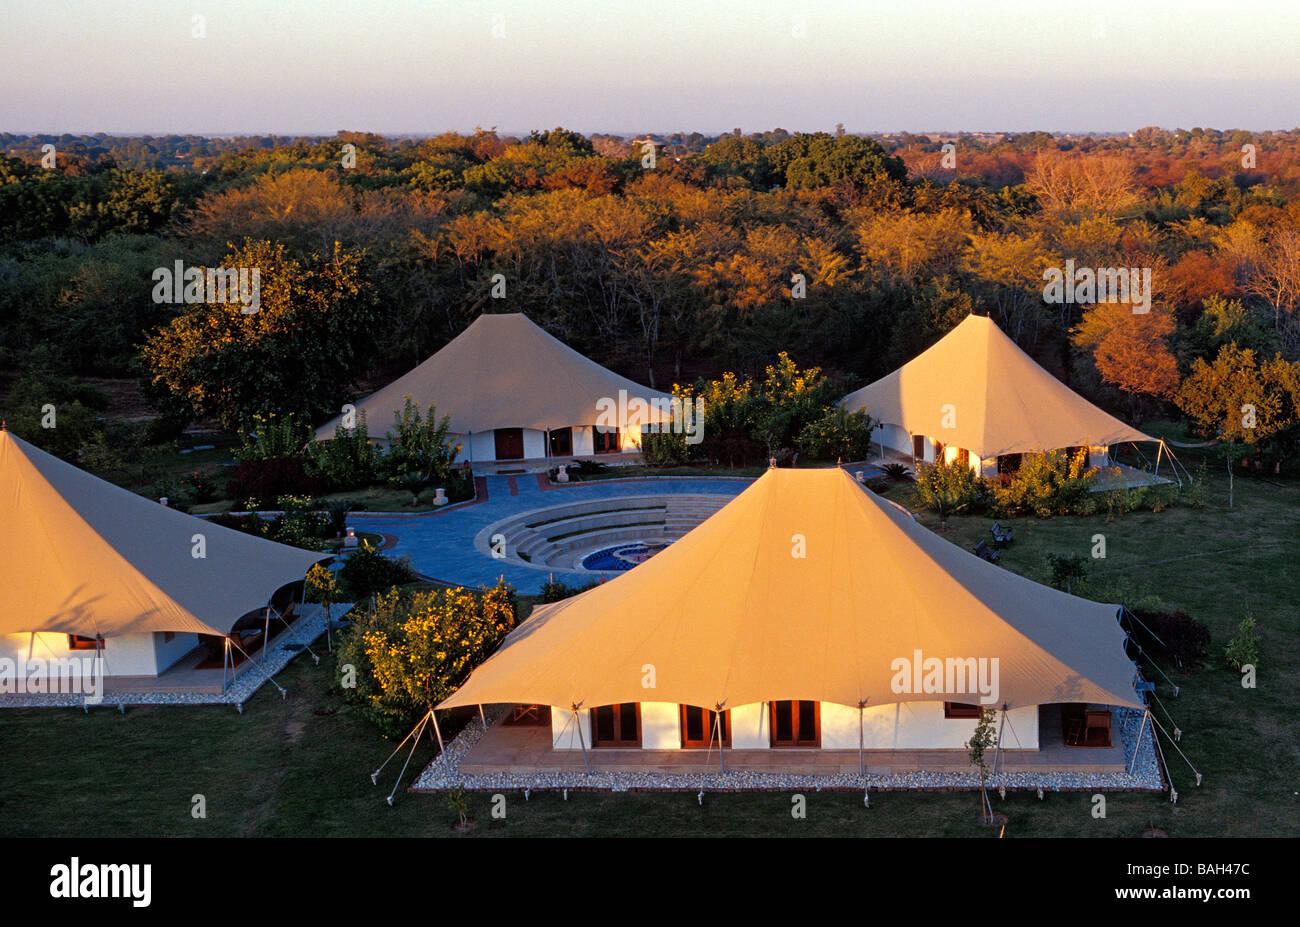 India Rajasthan State Ranthambore Oberoi Vanyavilas resort located next to the Ranthambore National Park and Tiger Reserve & India Rajasthan State Ranthambore Oberoi Vanyavilas resort ...